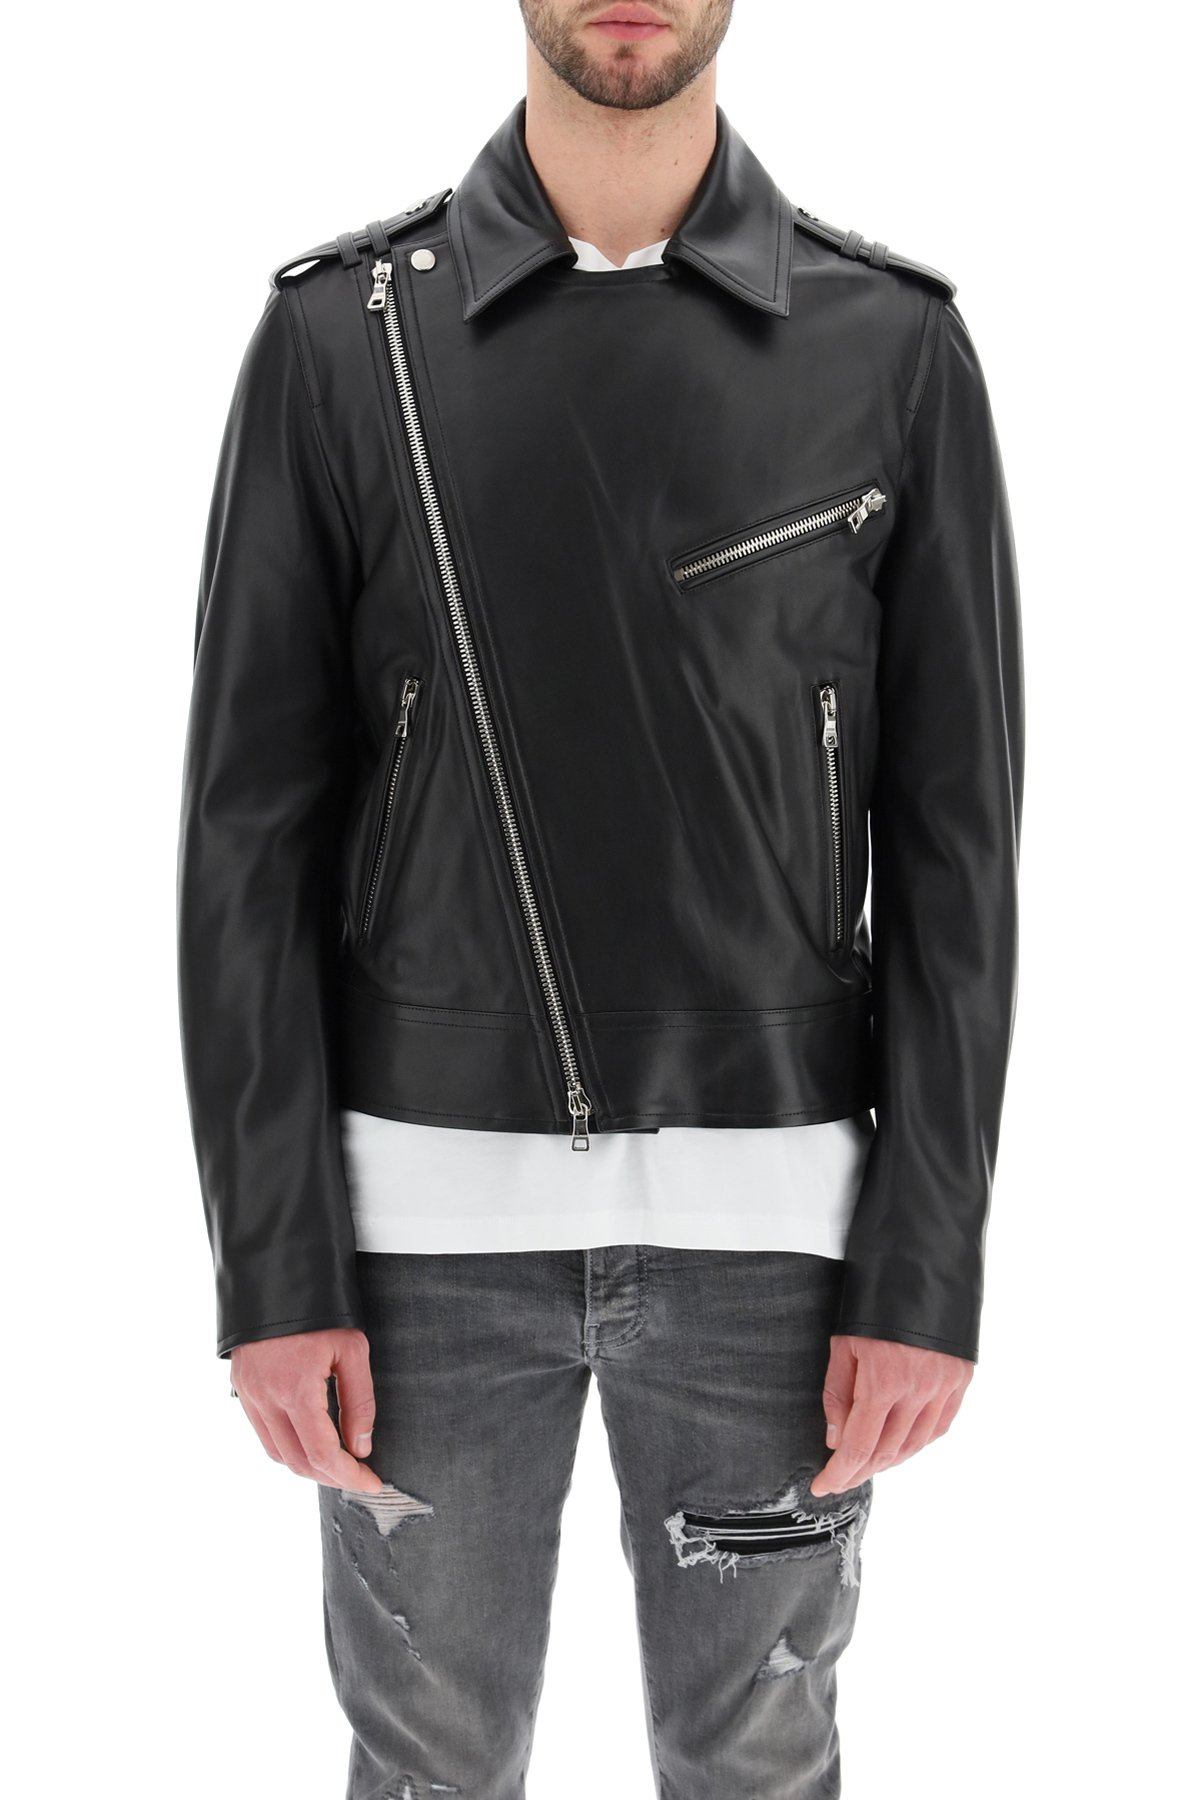 Balmain giacca biker